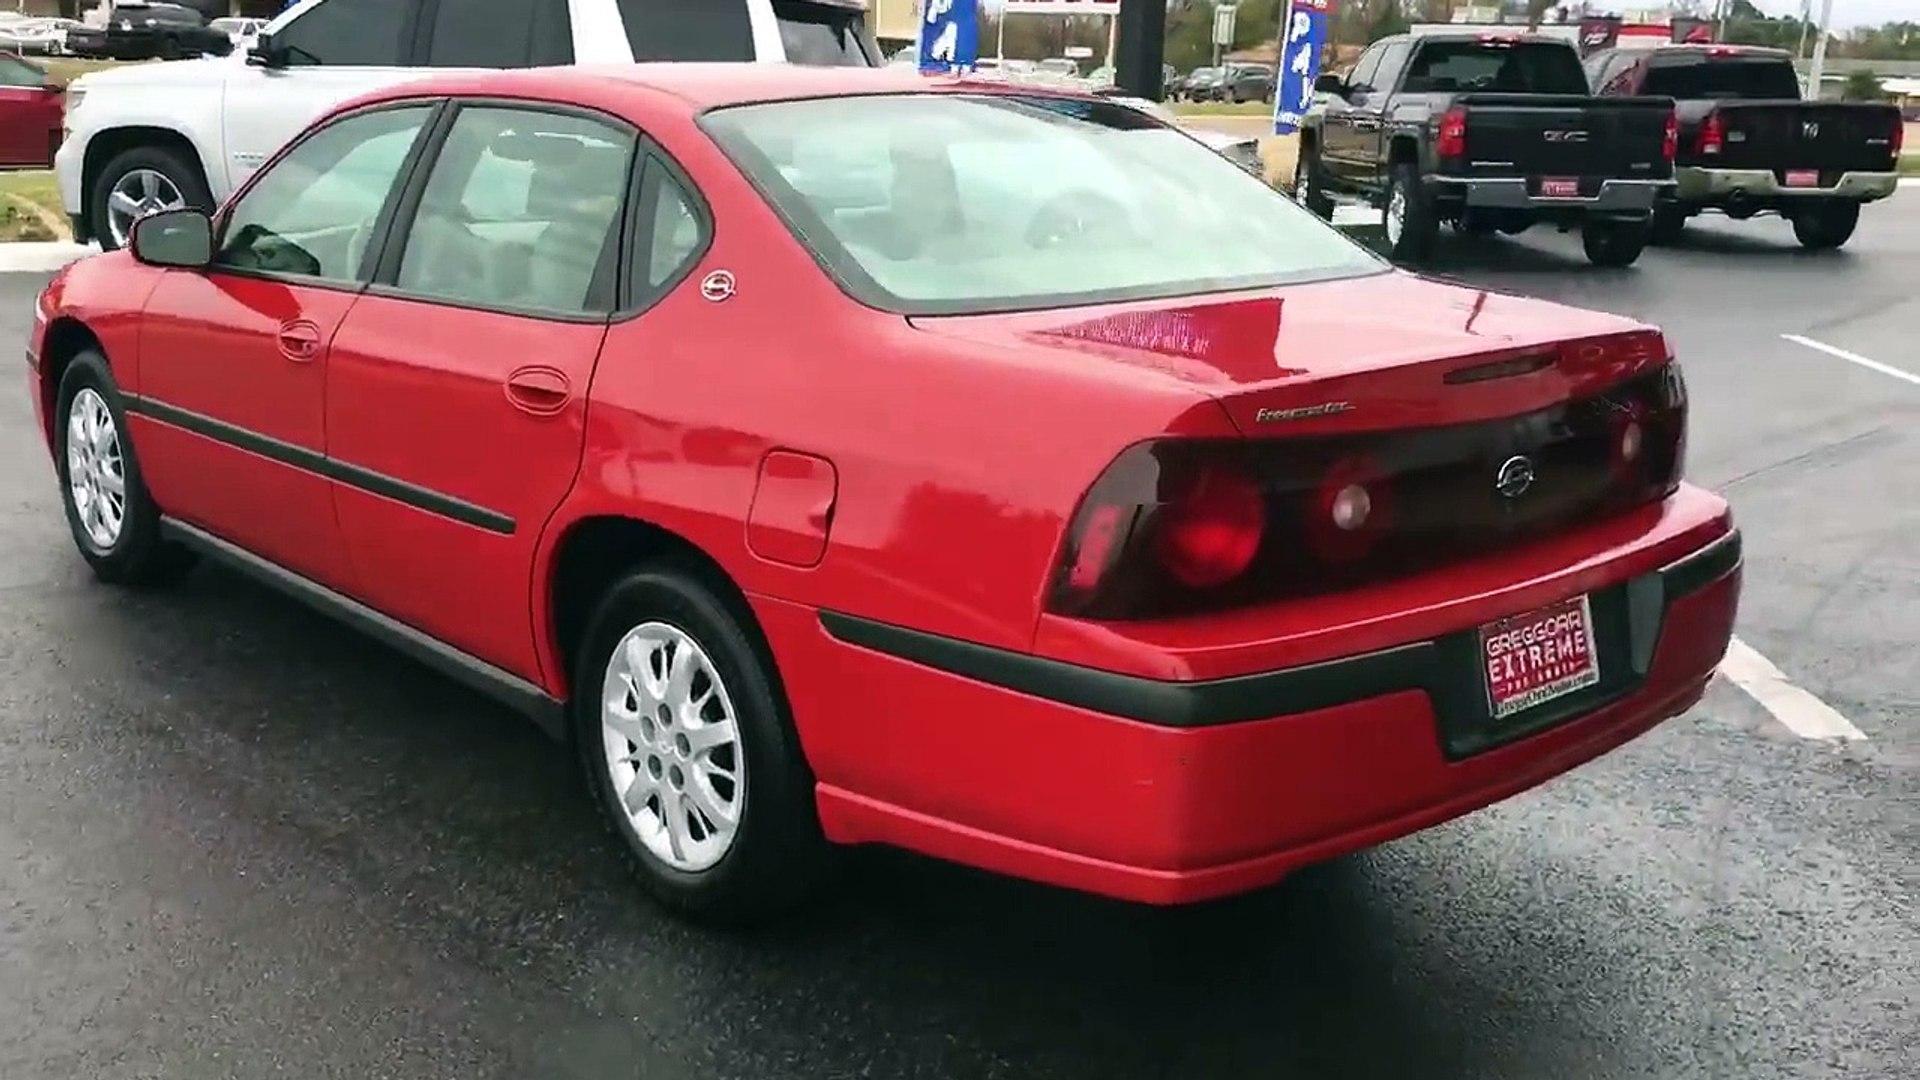 2003 Chevrolet Impala Texarkana, AR   Affordable Preowned Chevy Impala Texarkana, AR